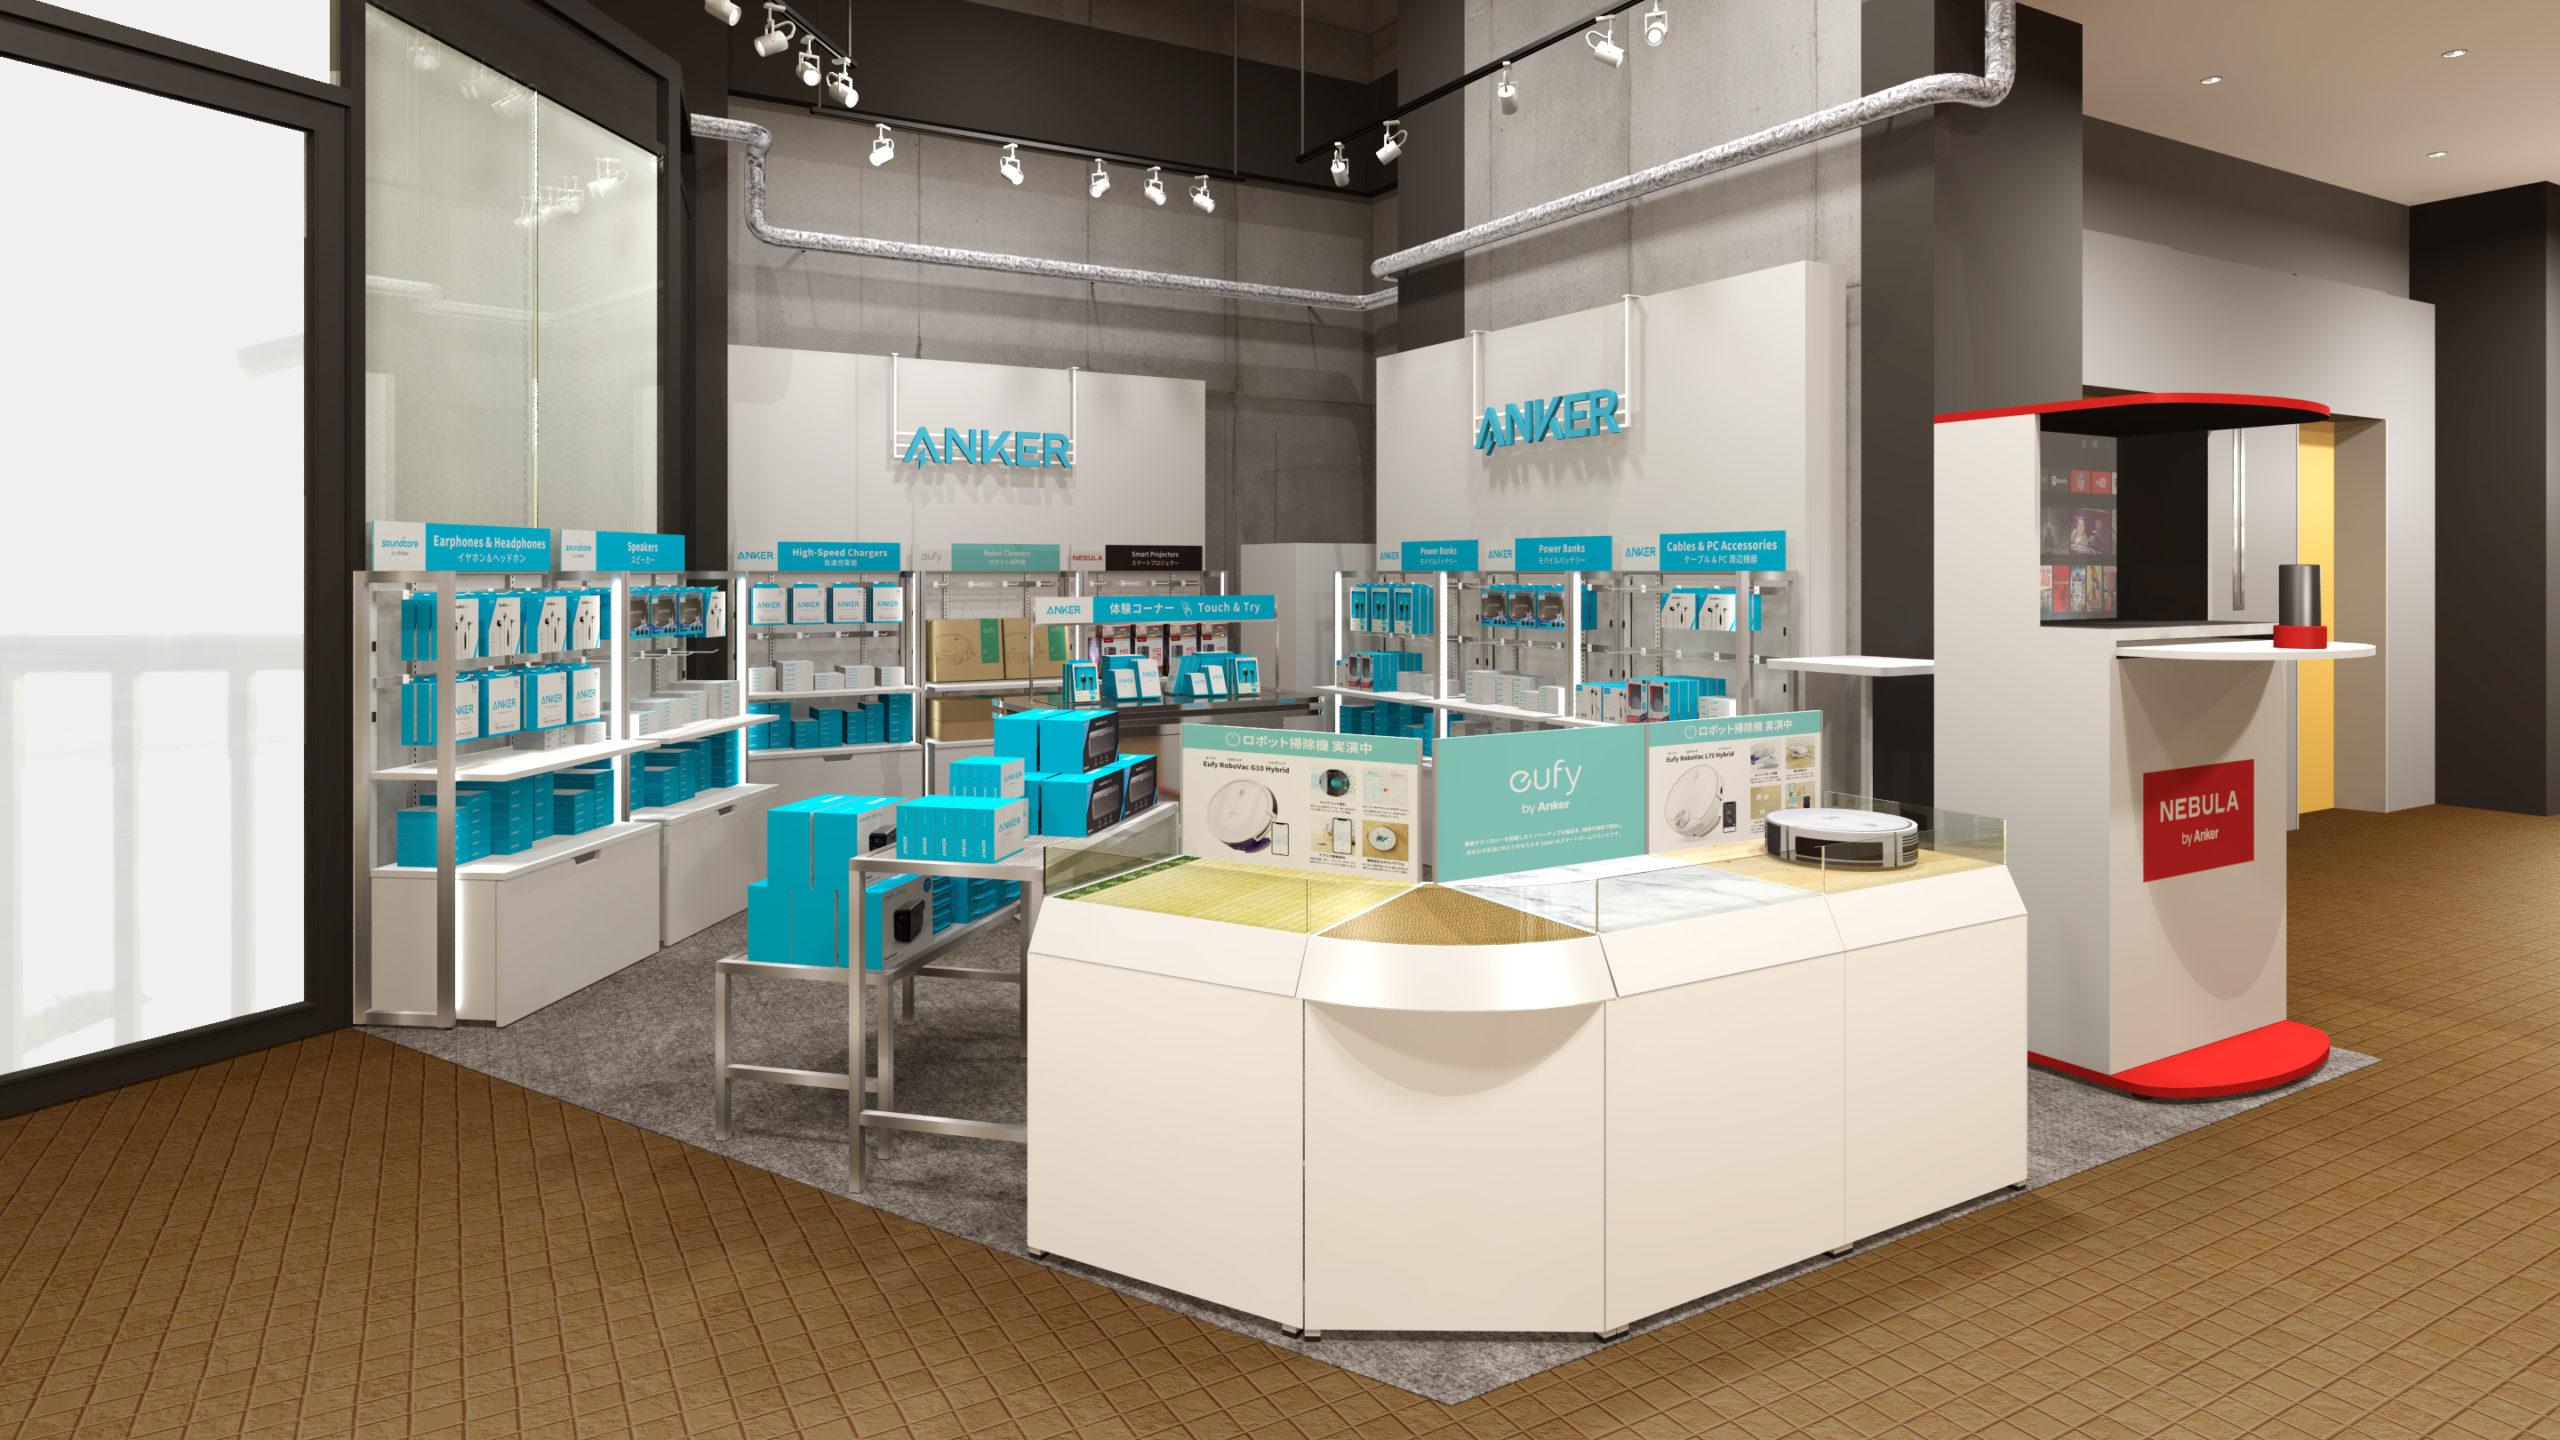 AnkerStore 南青山が閉店セールで最大30%OFFセール。8/29~8/31。梅田ロフト店がオープンで10%OFF&スマートスピーカー「Zolo SonicG」がもらえる。9/5~9/13。